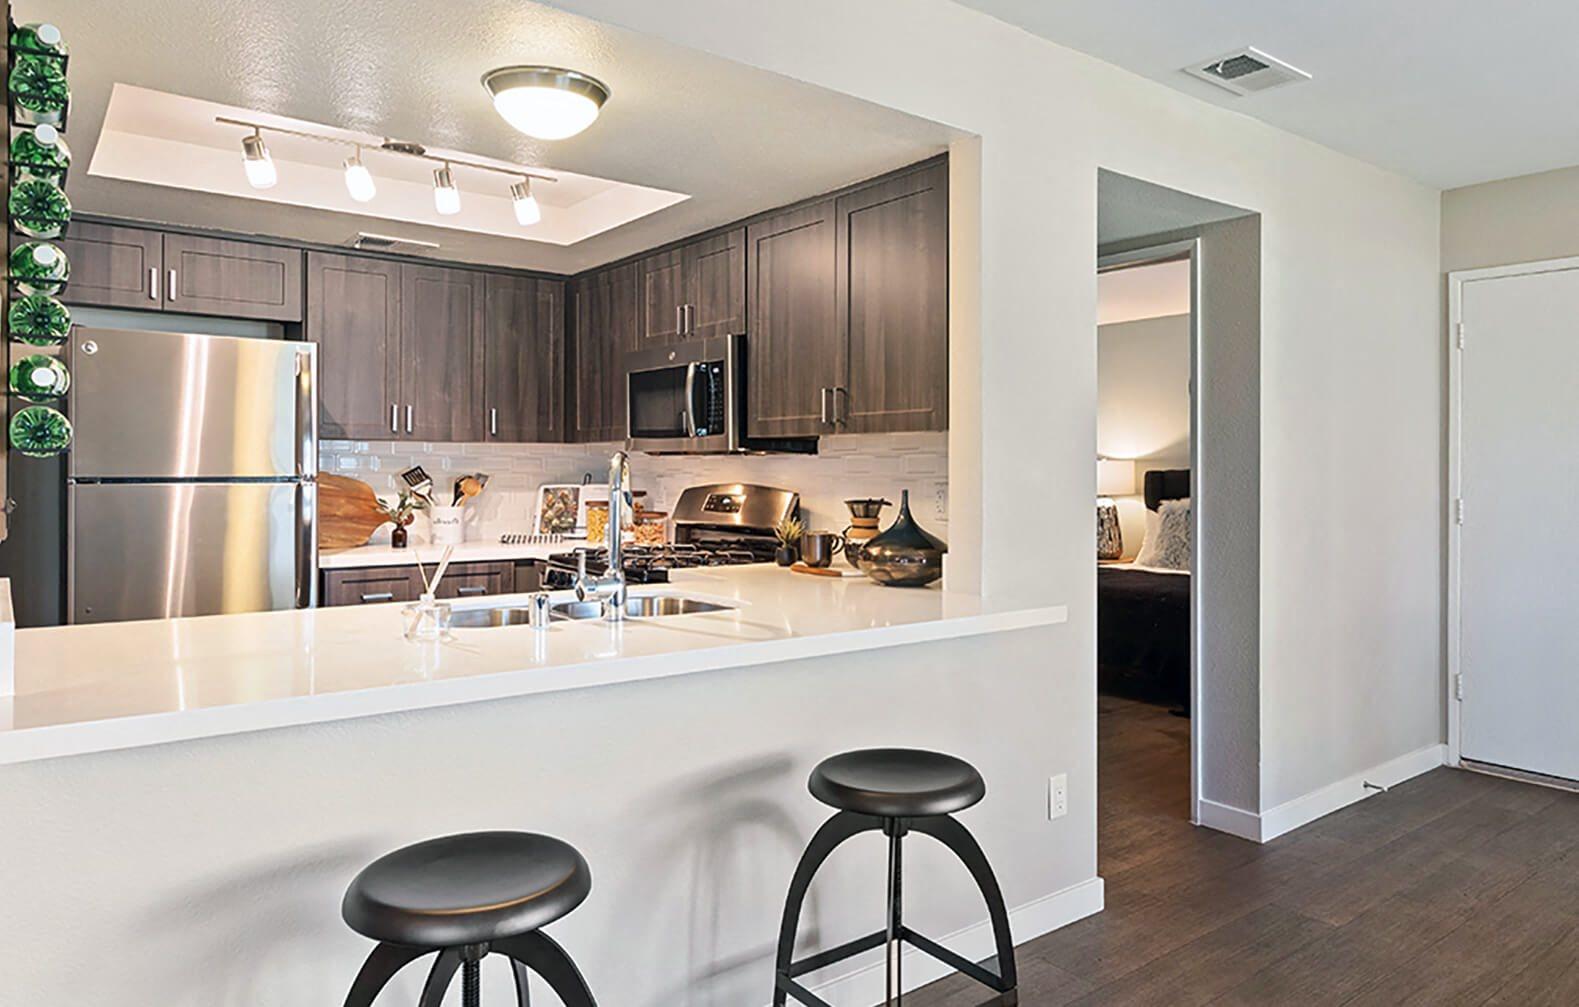 Upgraded kitchen at Hensley at Corona Pointe Apartments